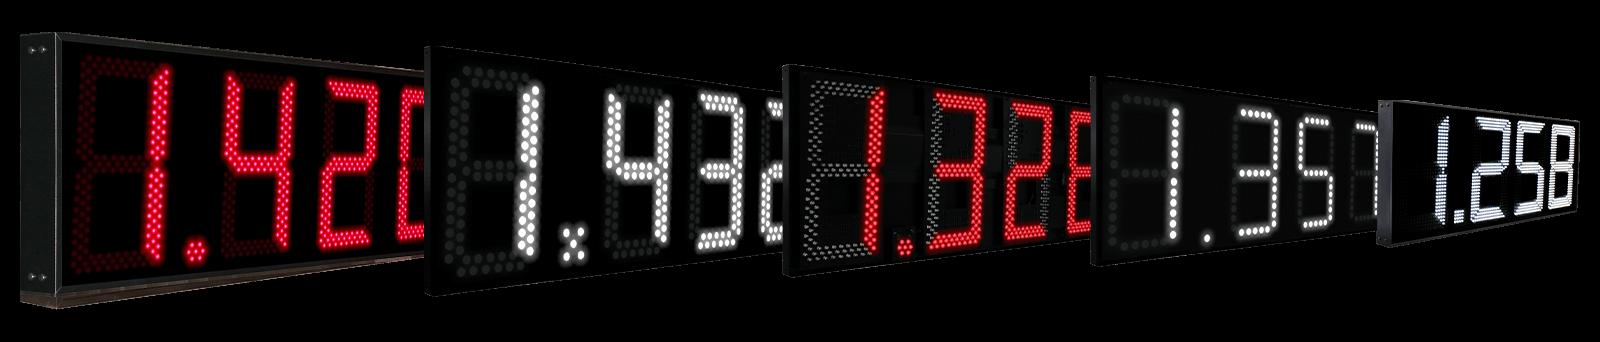 Precios de Combustible LED 1